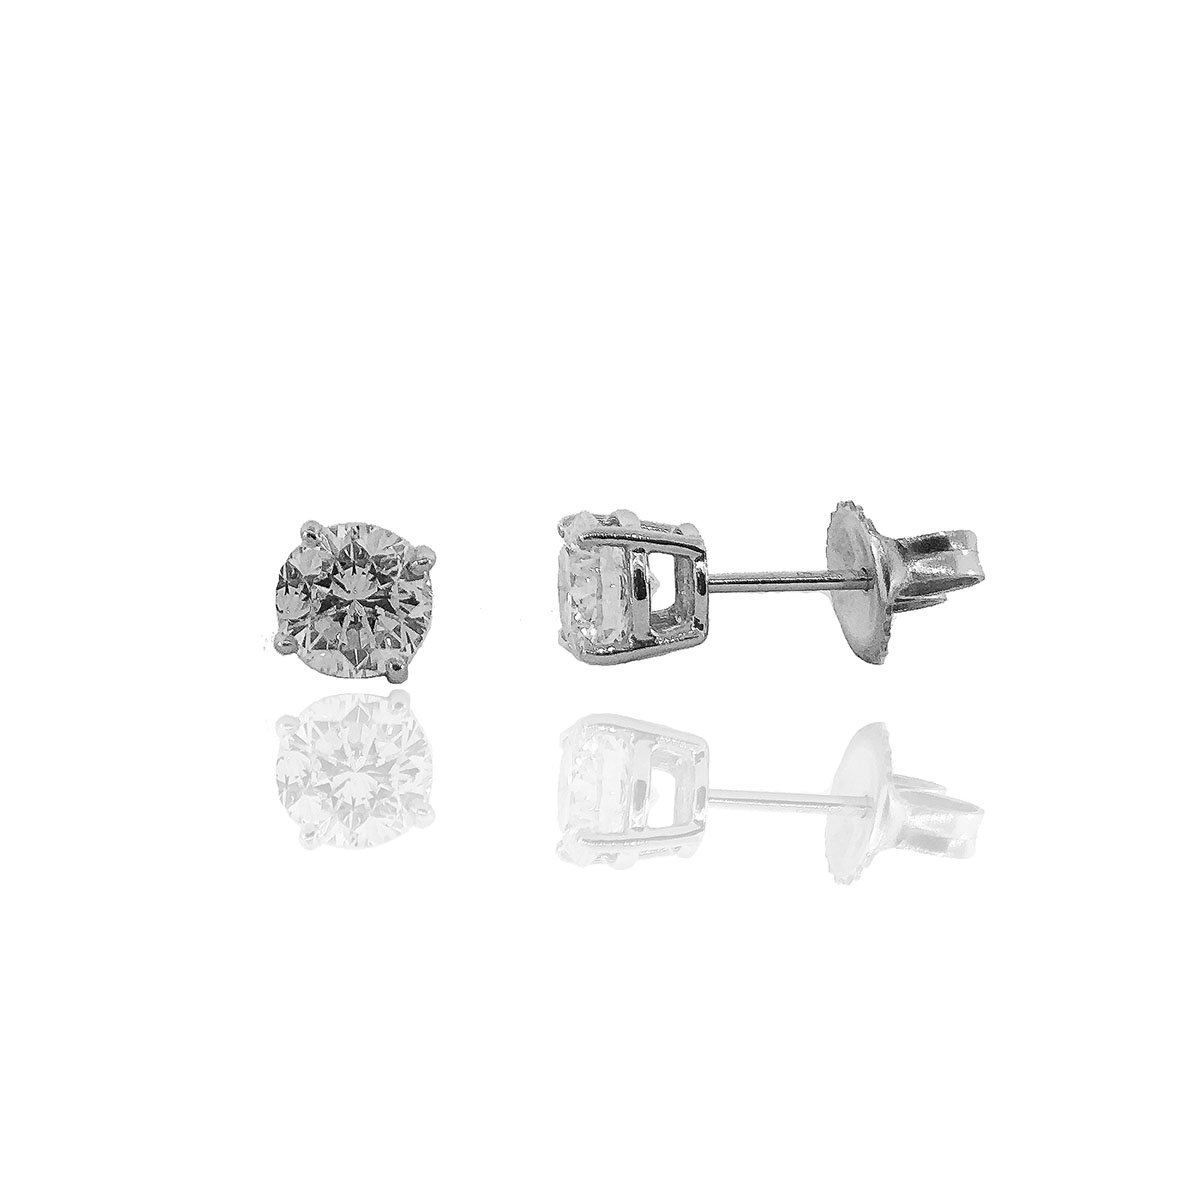 14K White Gold Diamond Stud Earrings, 20 Days of Diamonds, Diamond Essentials, Holiday Gifts, Holiday 2017, NYC Diamond District